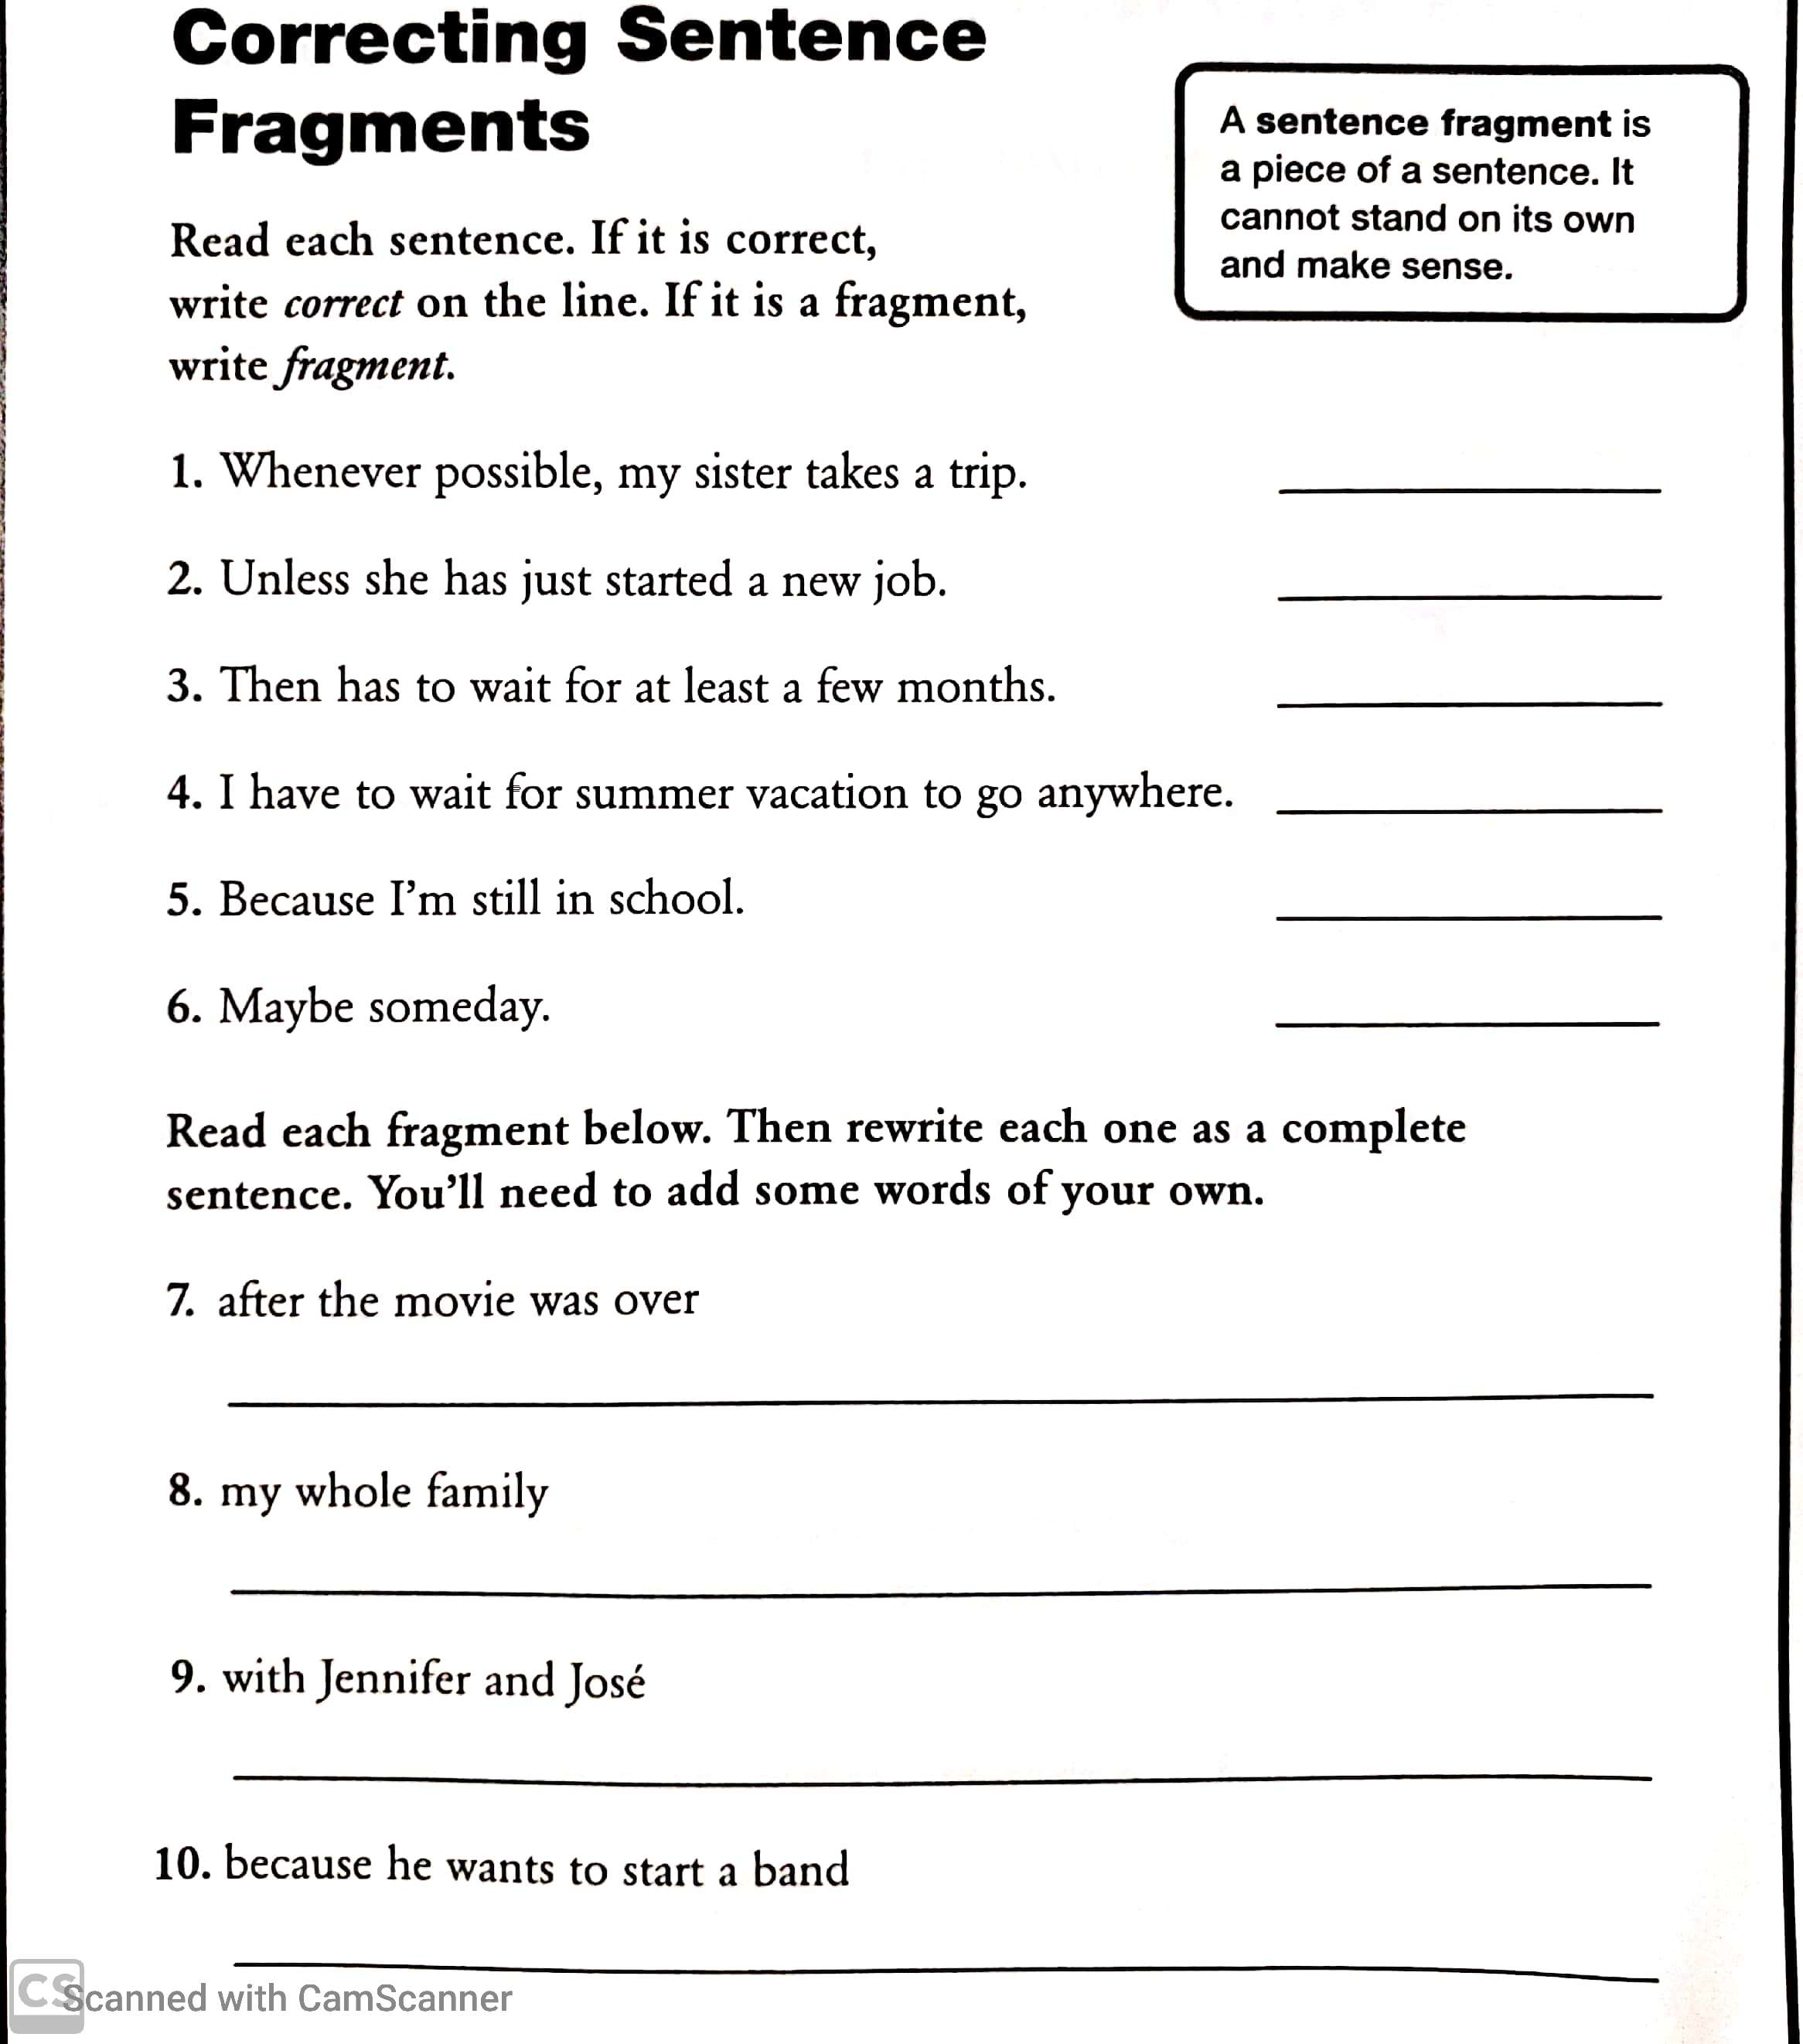 Word Study Lesson Correcting Sentence Fragments